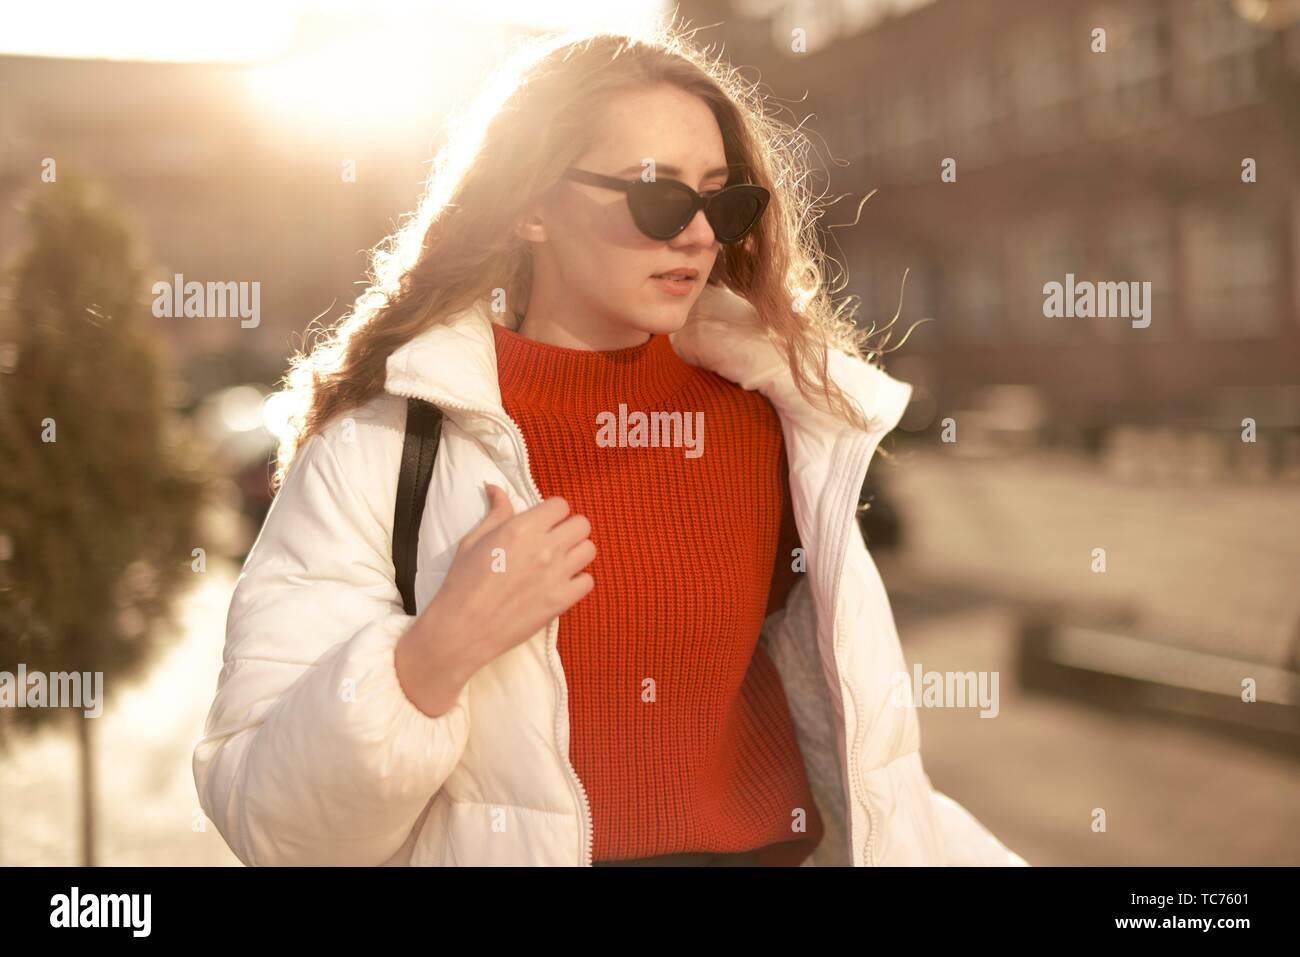 young stylish woman wearing sunglasses, upper body shot, in city Cottbus, Brandenburg, Germany. - Stock Image